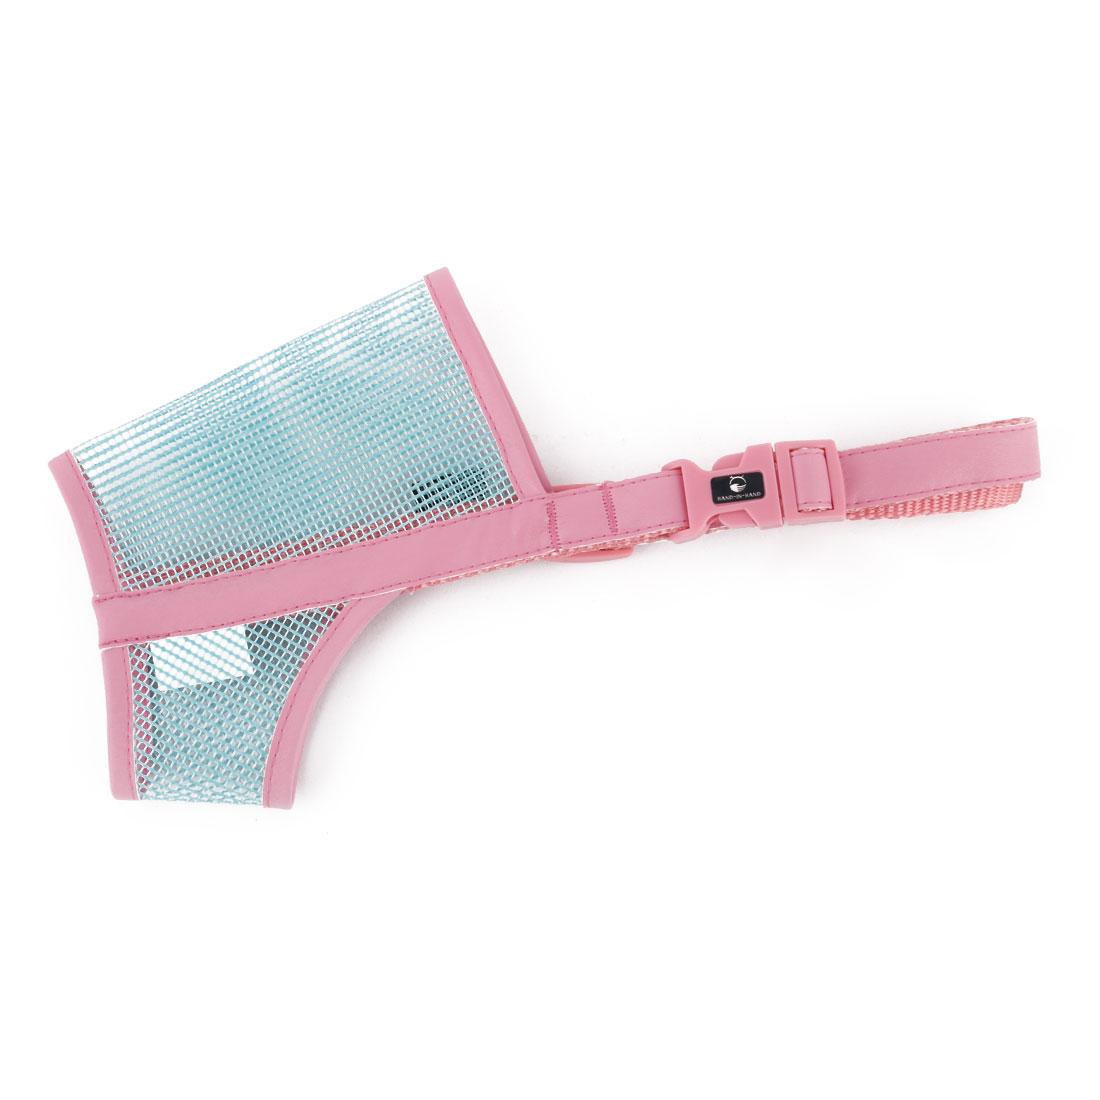 Pet Dog Puppy Plastic Adjustable Strap Anti Bite Mouth Mask Muzzle Guard Pink Blue Size XL